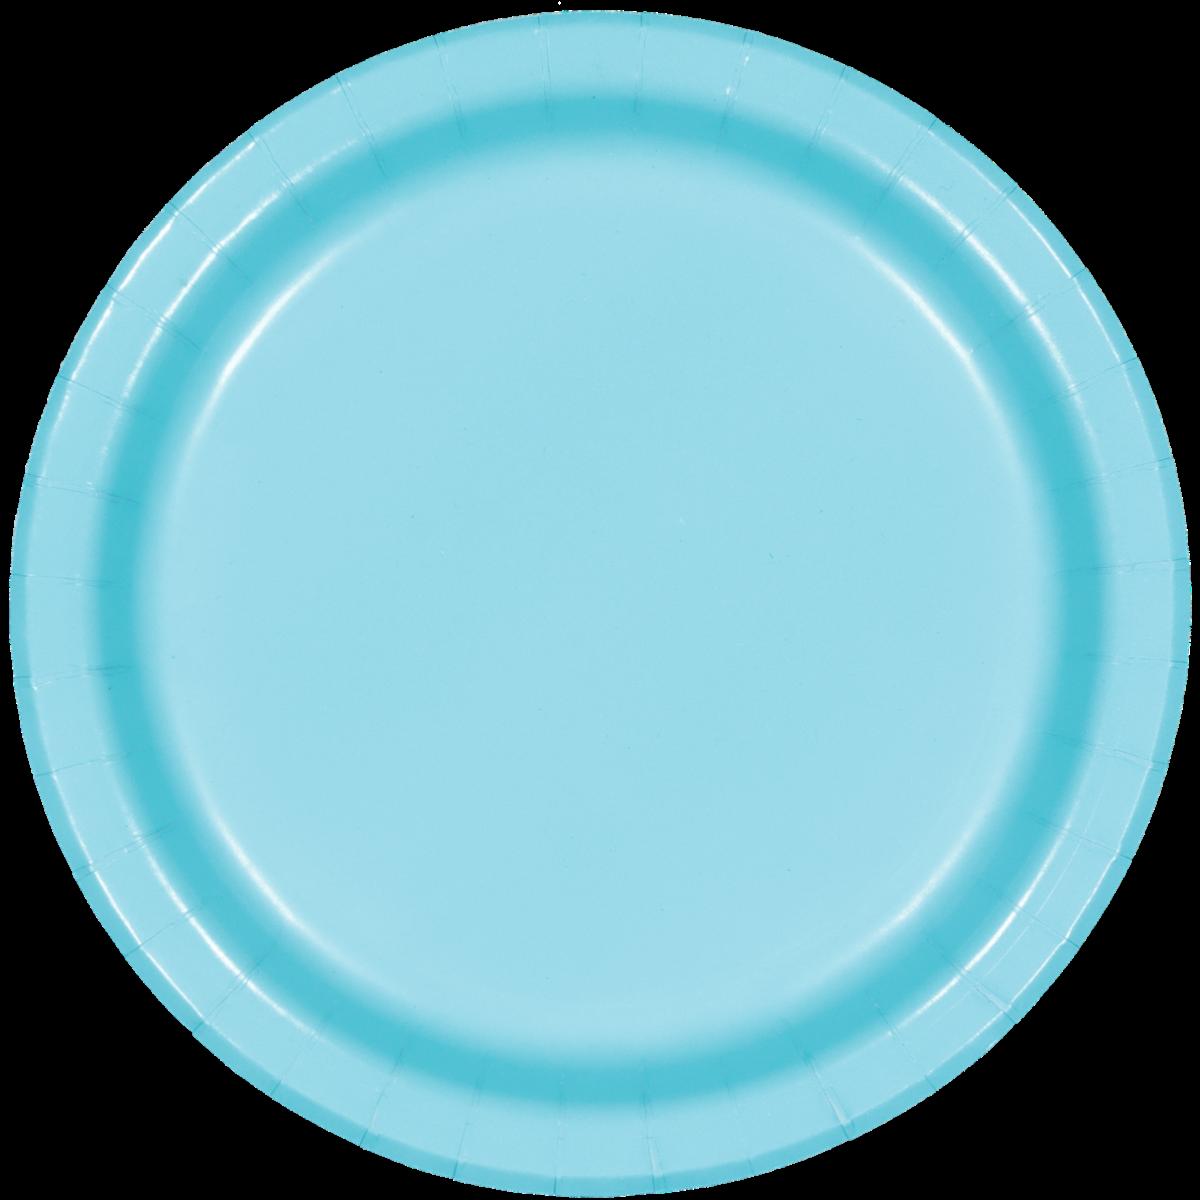 SOLID BERMUDA BLUE PLATES 8PCS